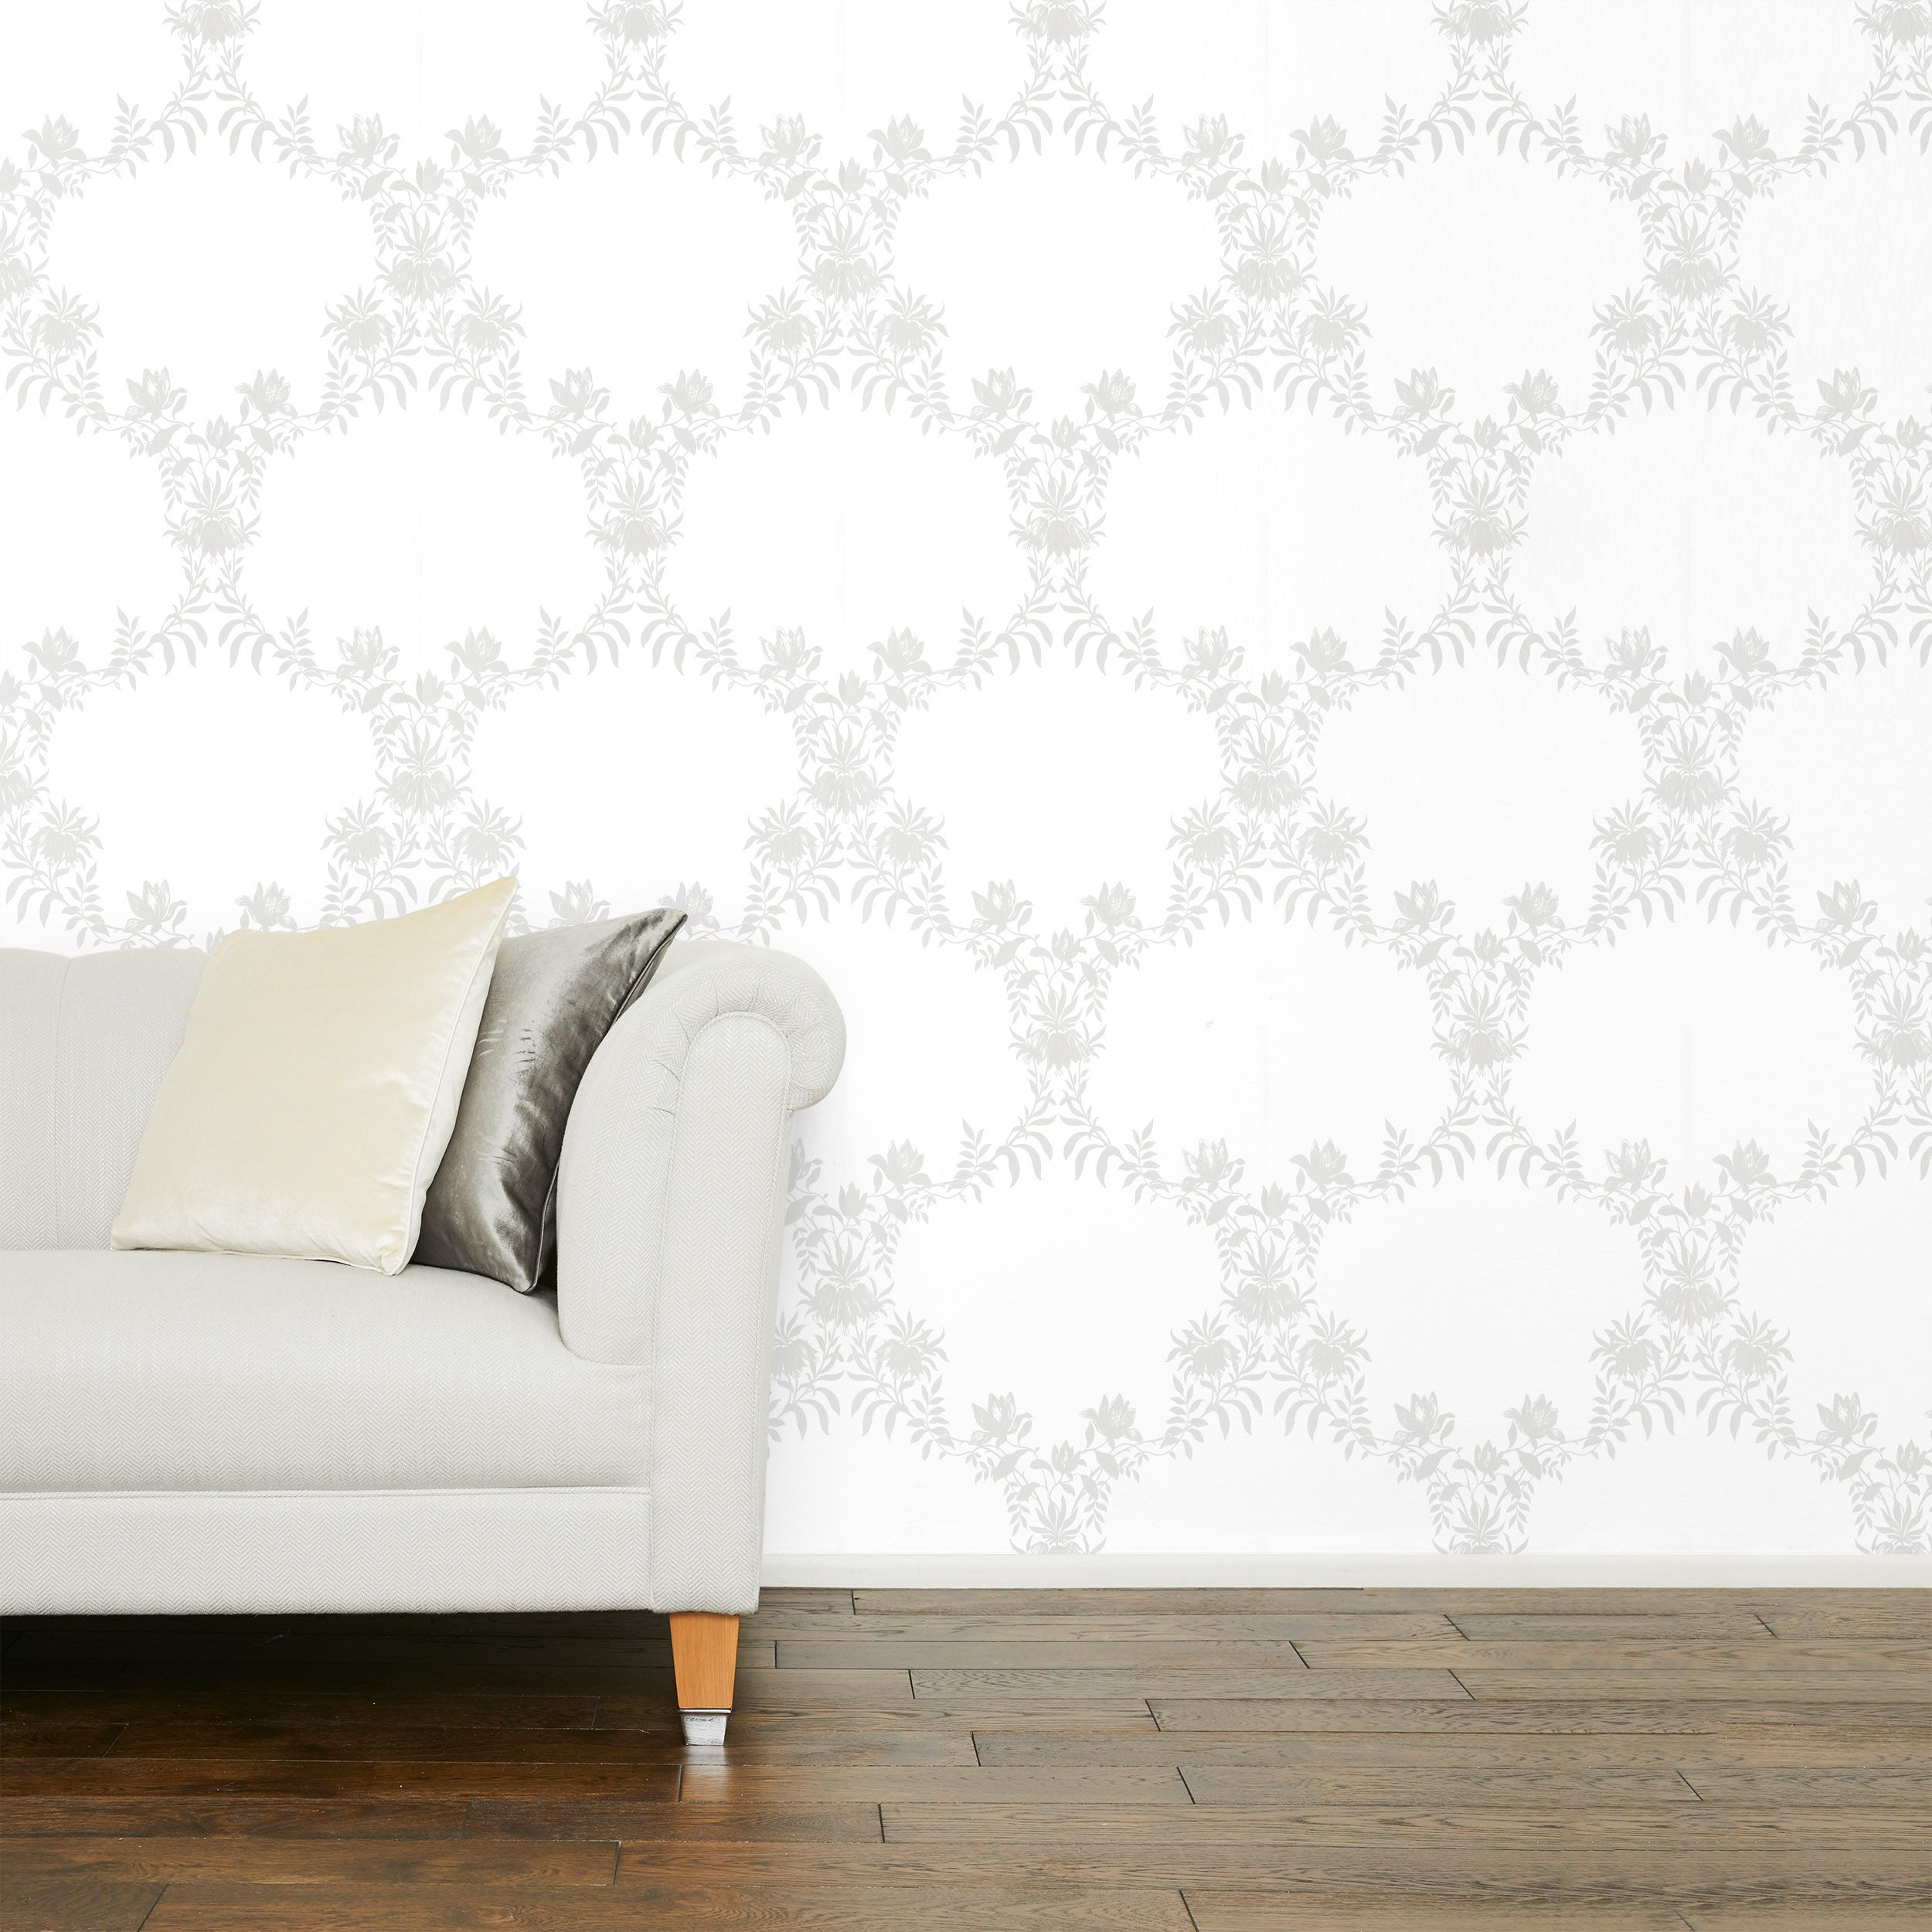 Parterre Trellis Silver Wallpaper In 2020 Home Furnishings Childrens Room Decor Furnishings